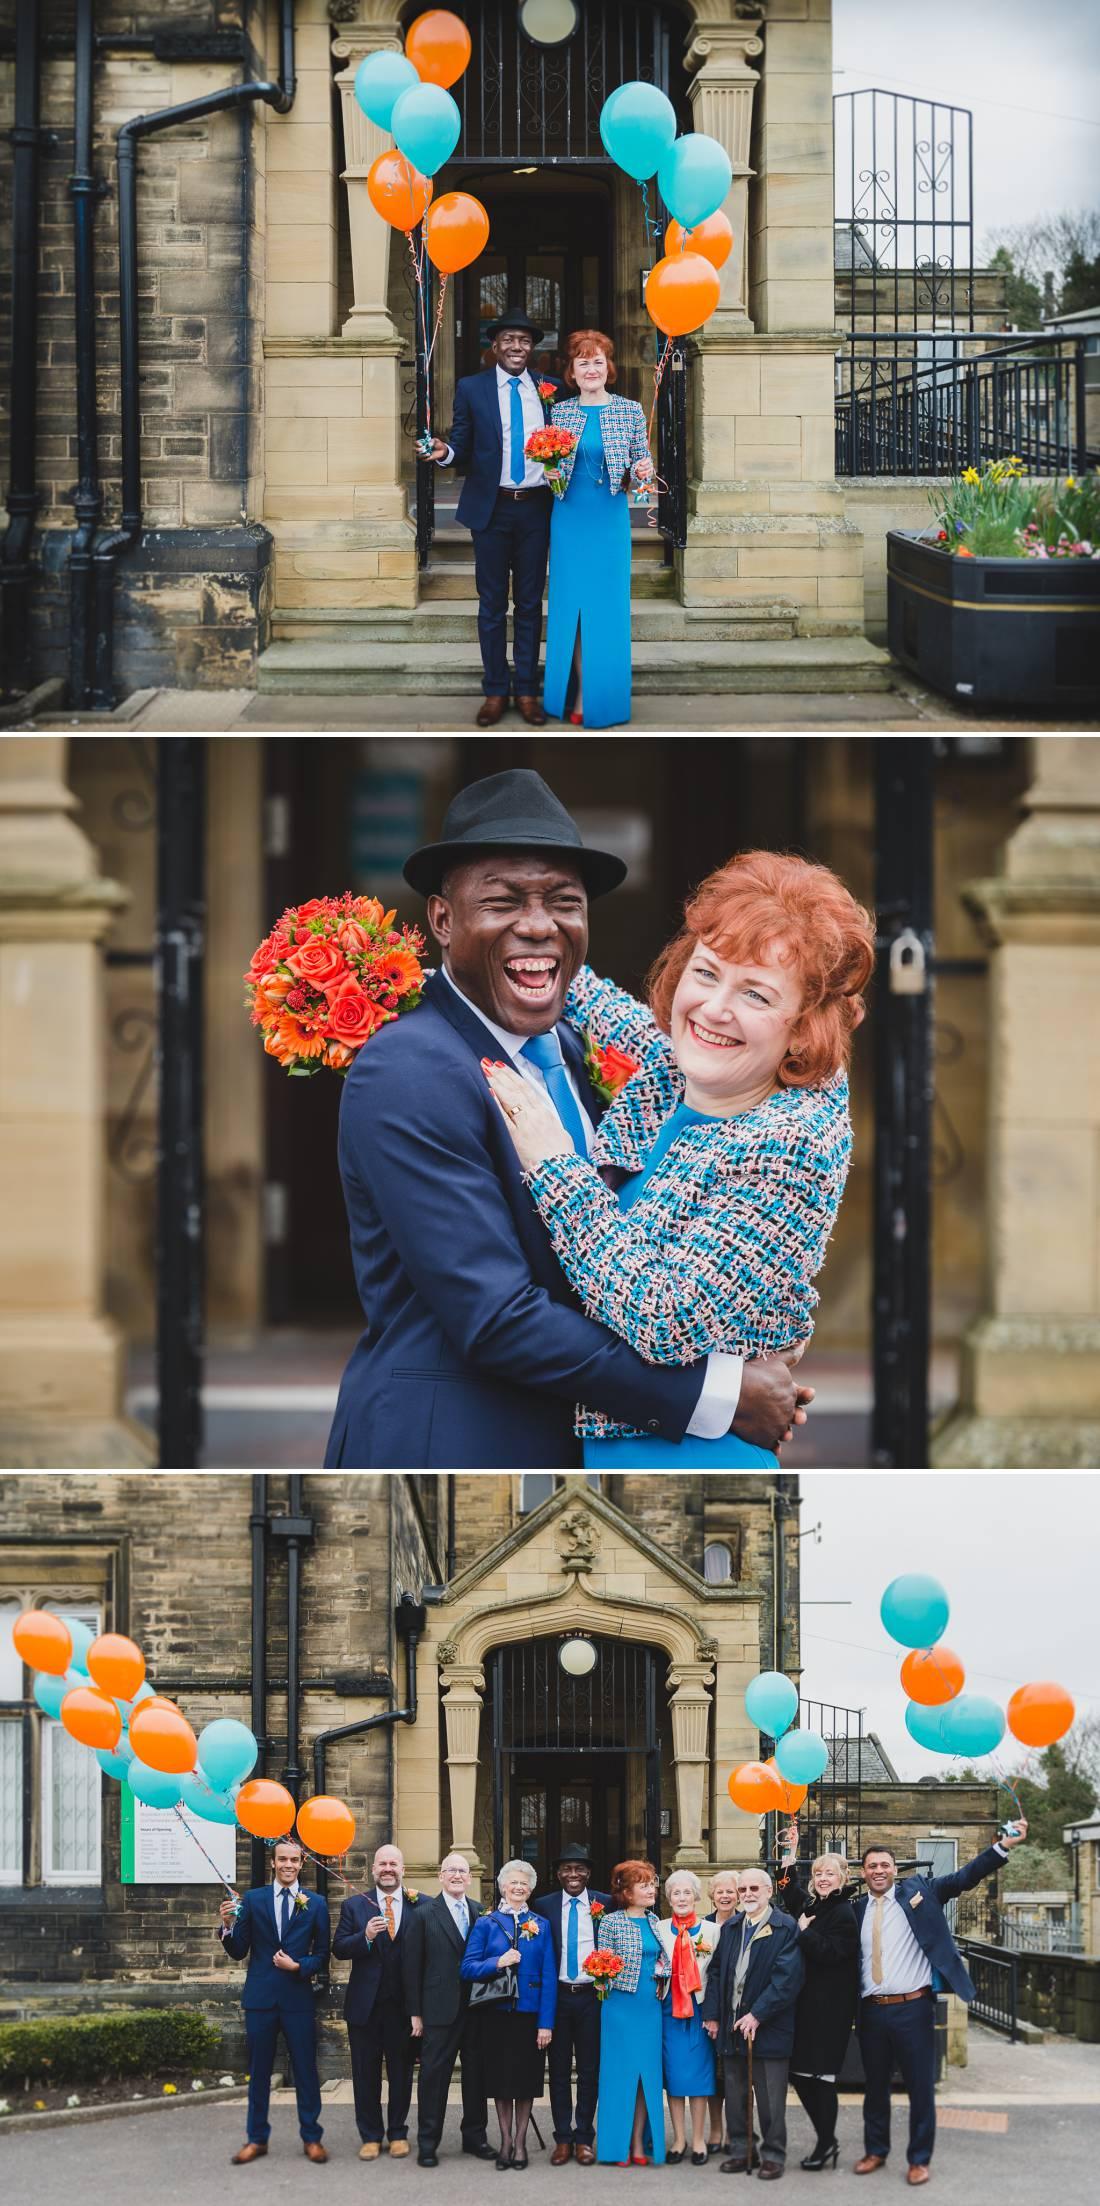 Halifax Registry office Wedding - Jane and Larteque 8